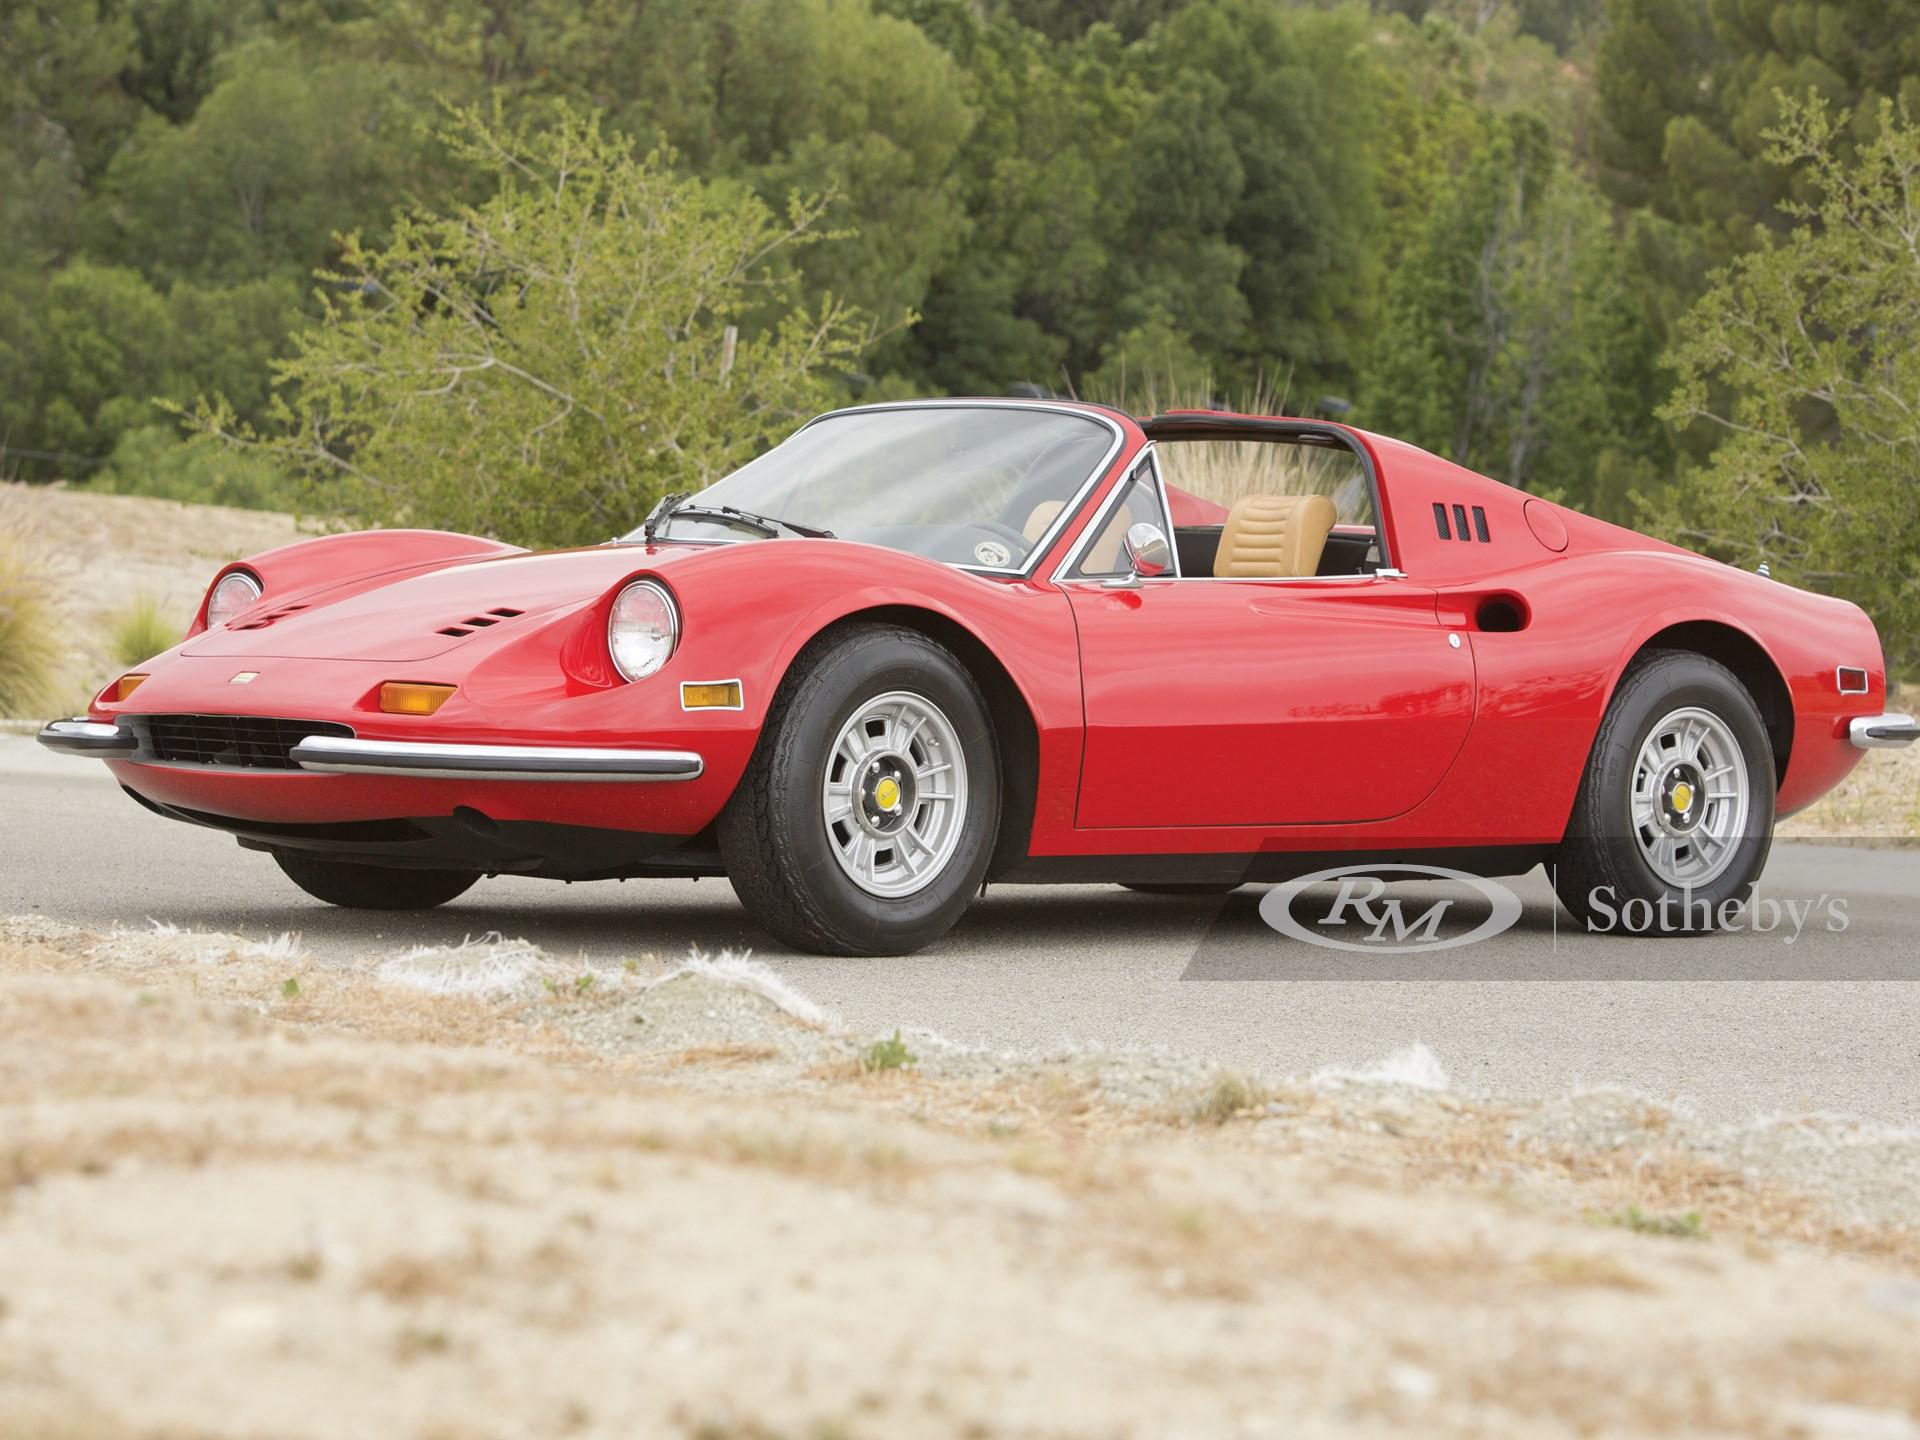 1973 Ferrari Dino 246 Gts Monterey 2014 Rm Sotheby S